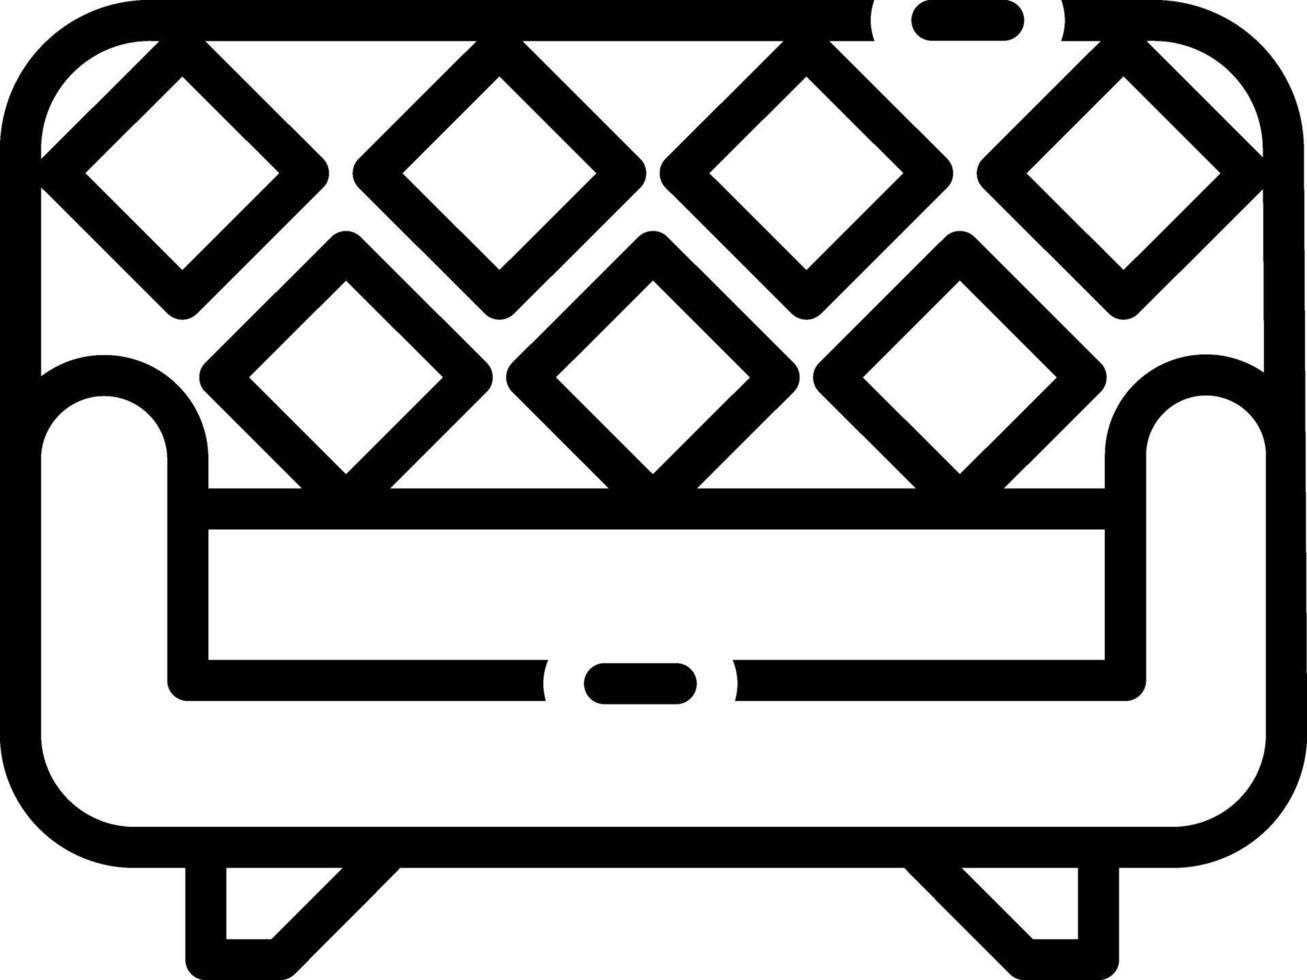 Liniensymbol für Sofa vektor